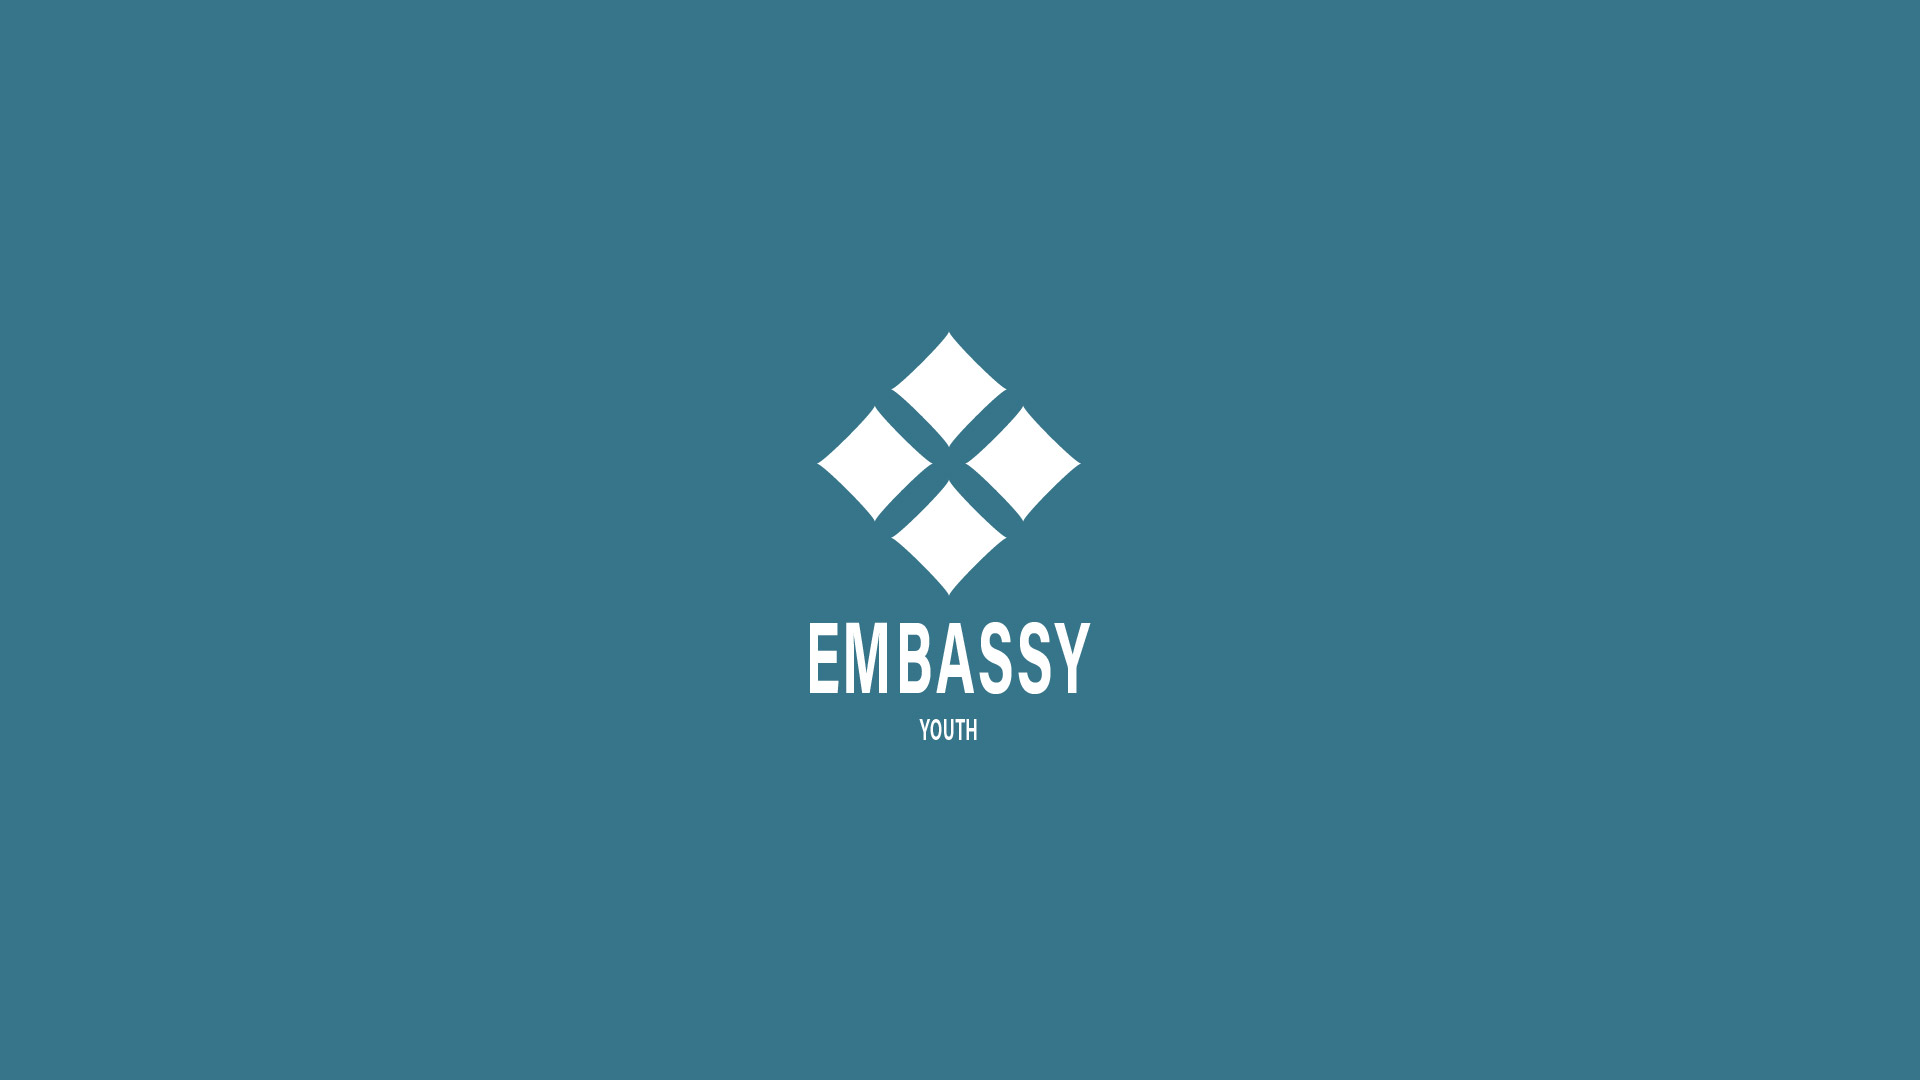 Embassy Youth